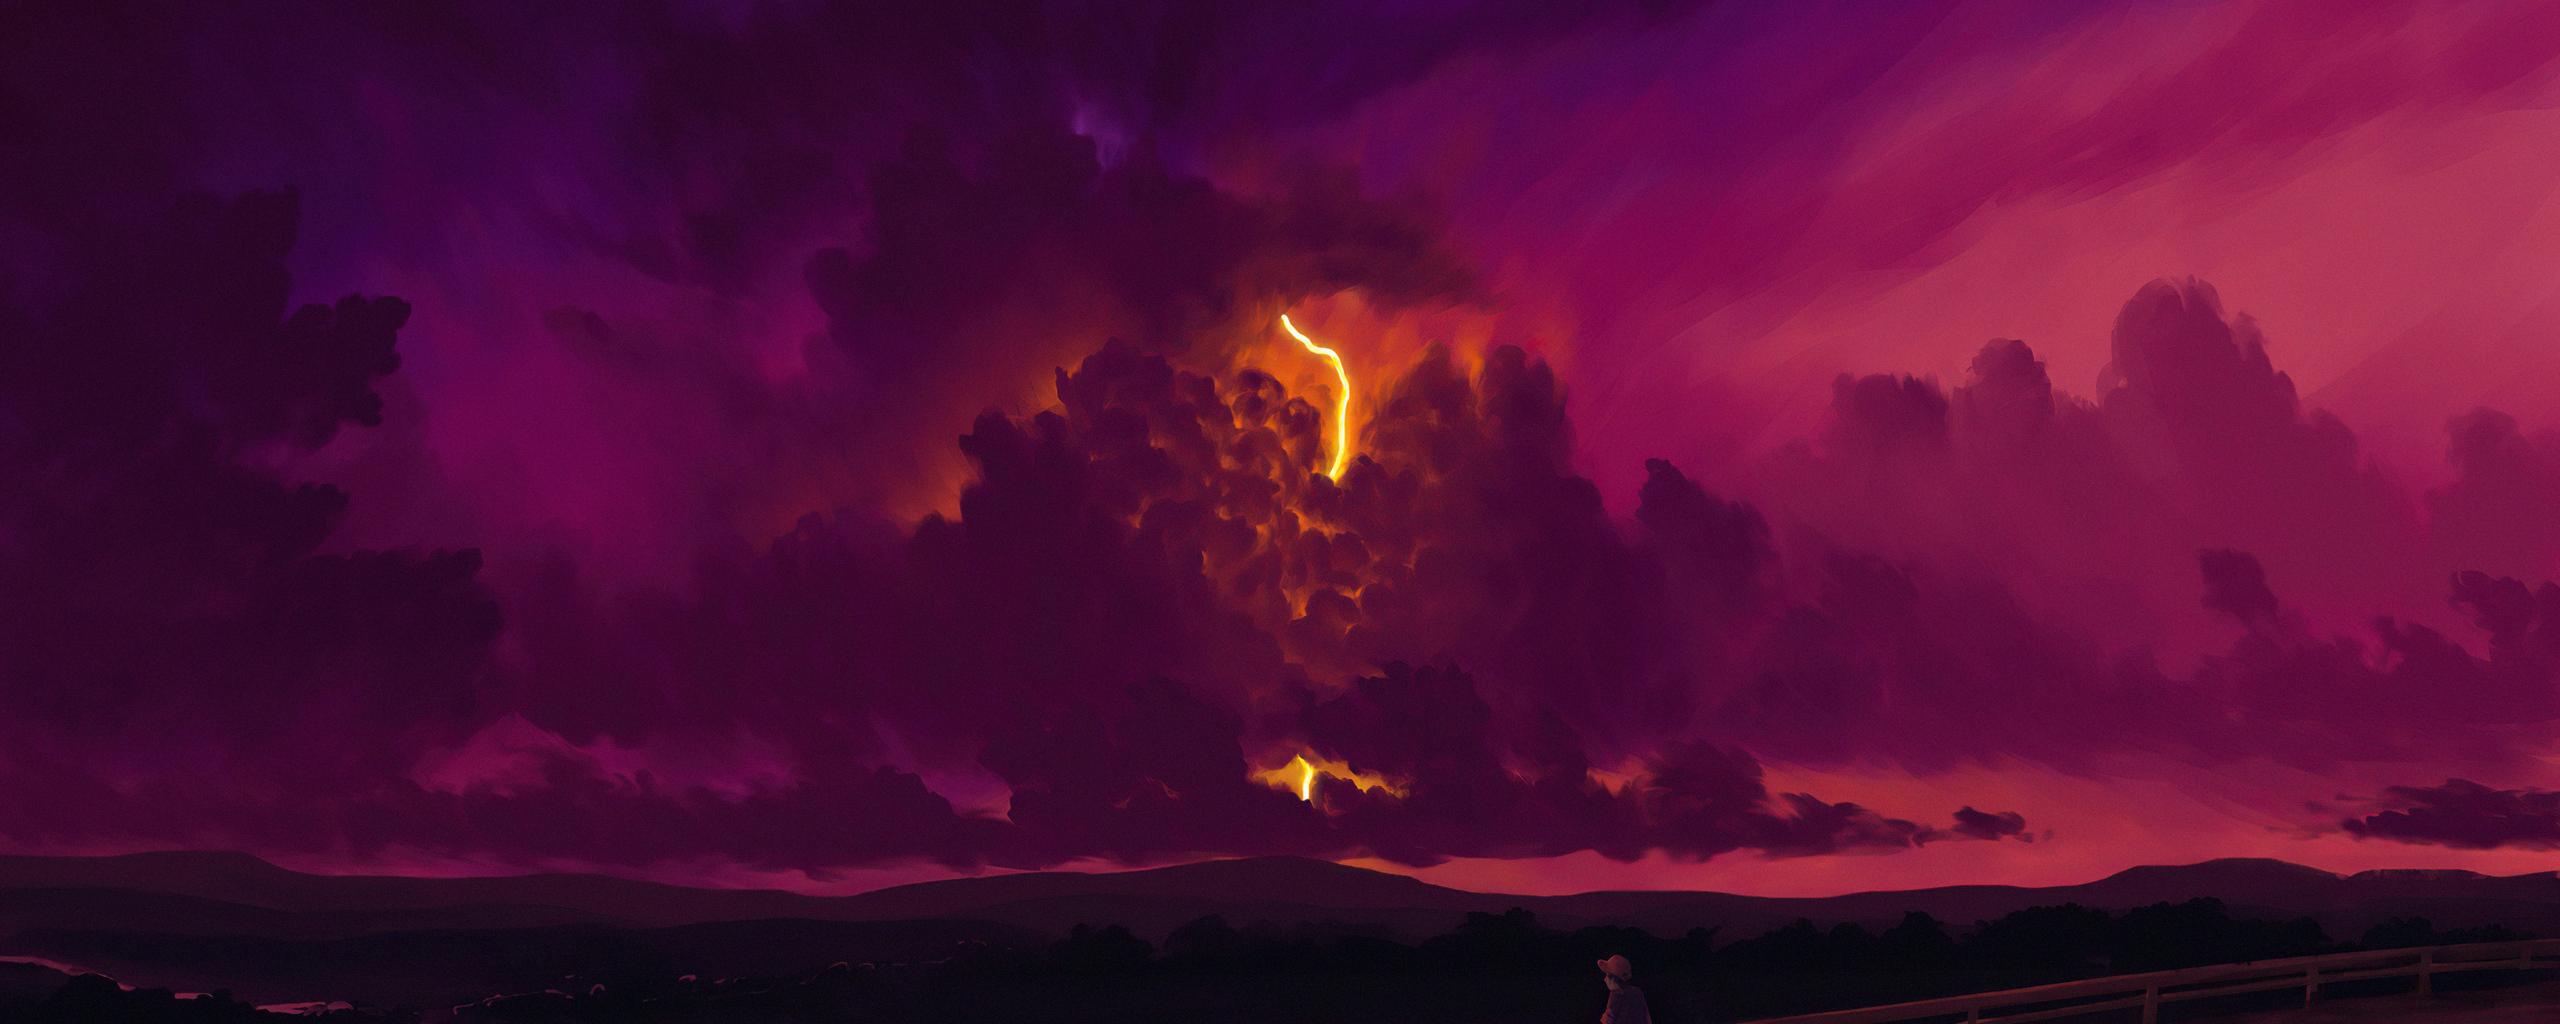 storm-on-the-way-4k-ne.jpg